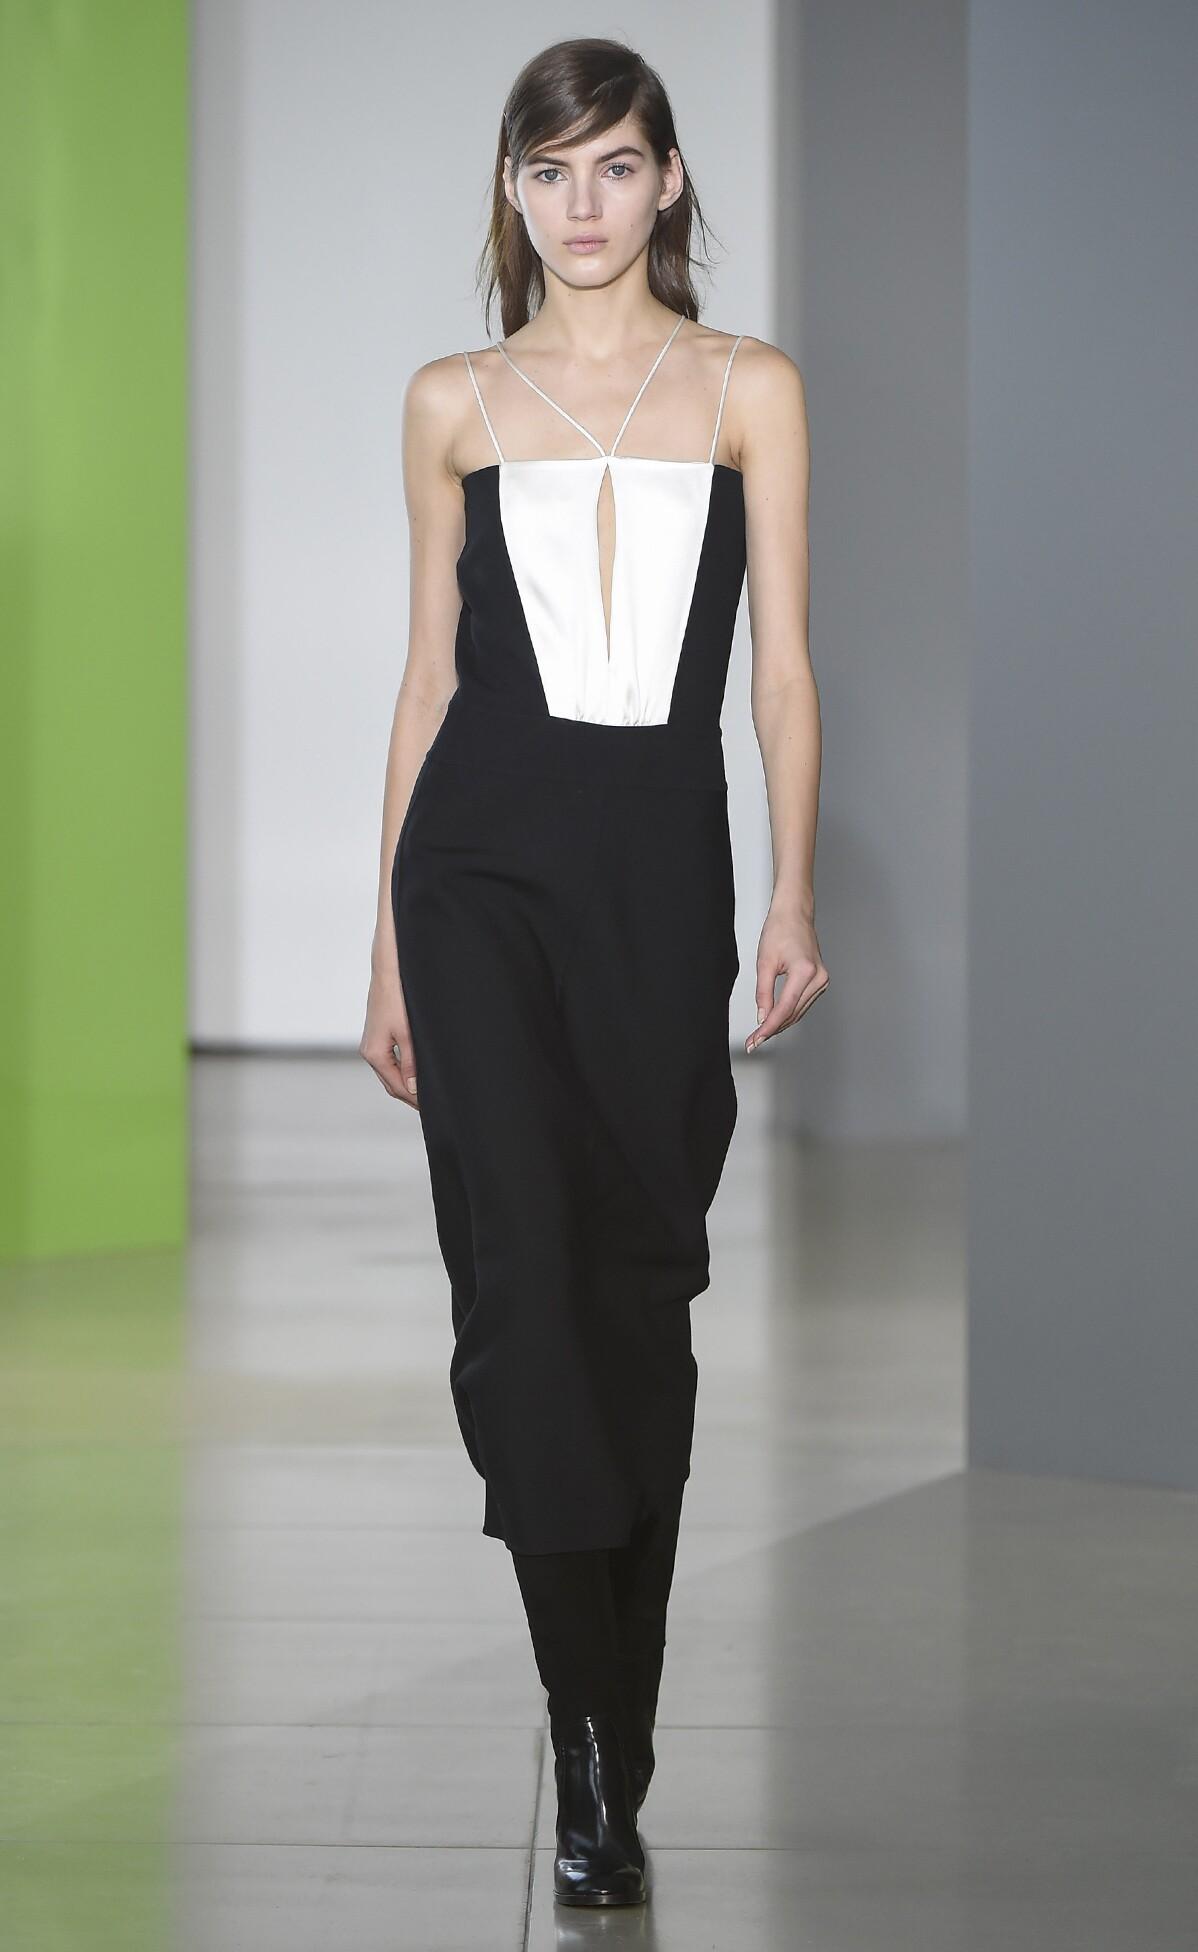 Fashion Show FW 2015 2016 Jil Sander Womenswear